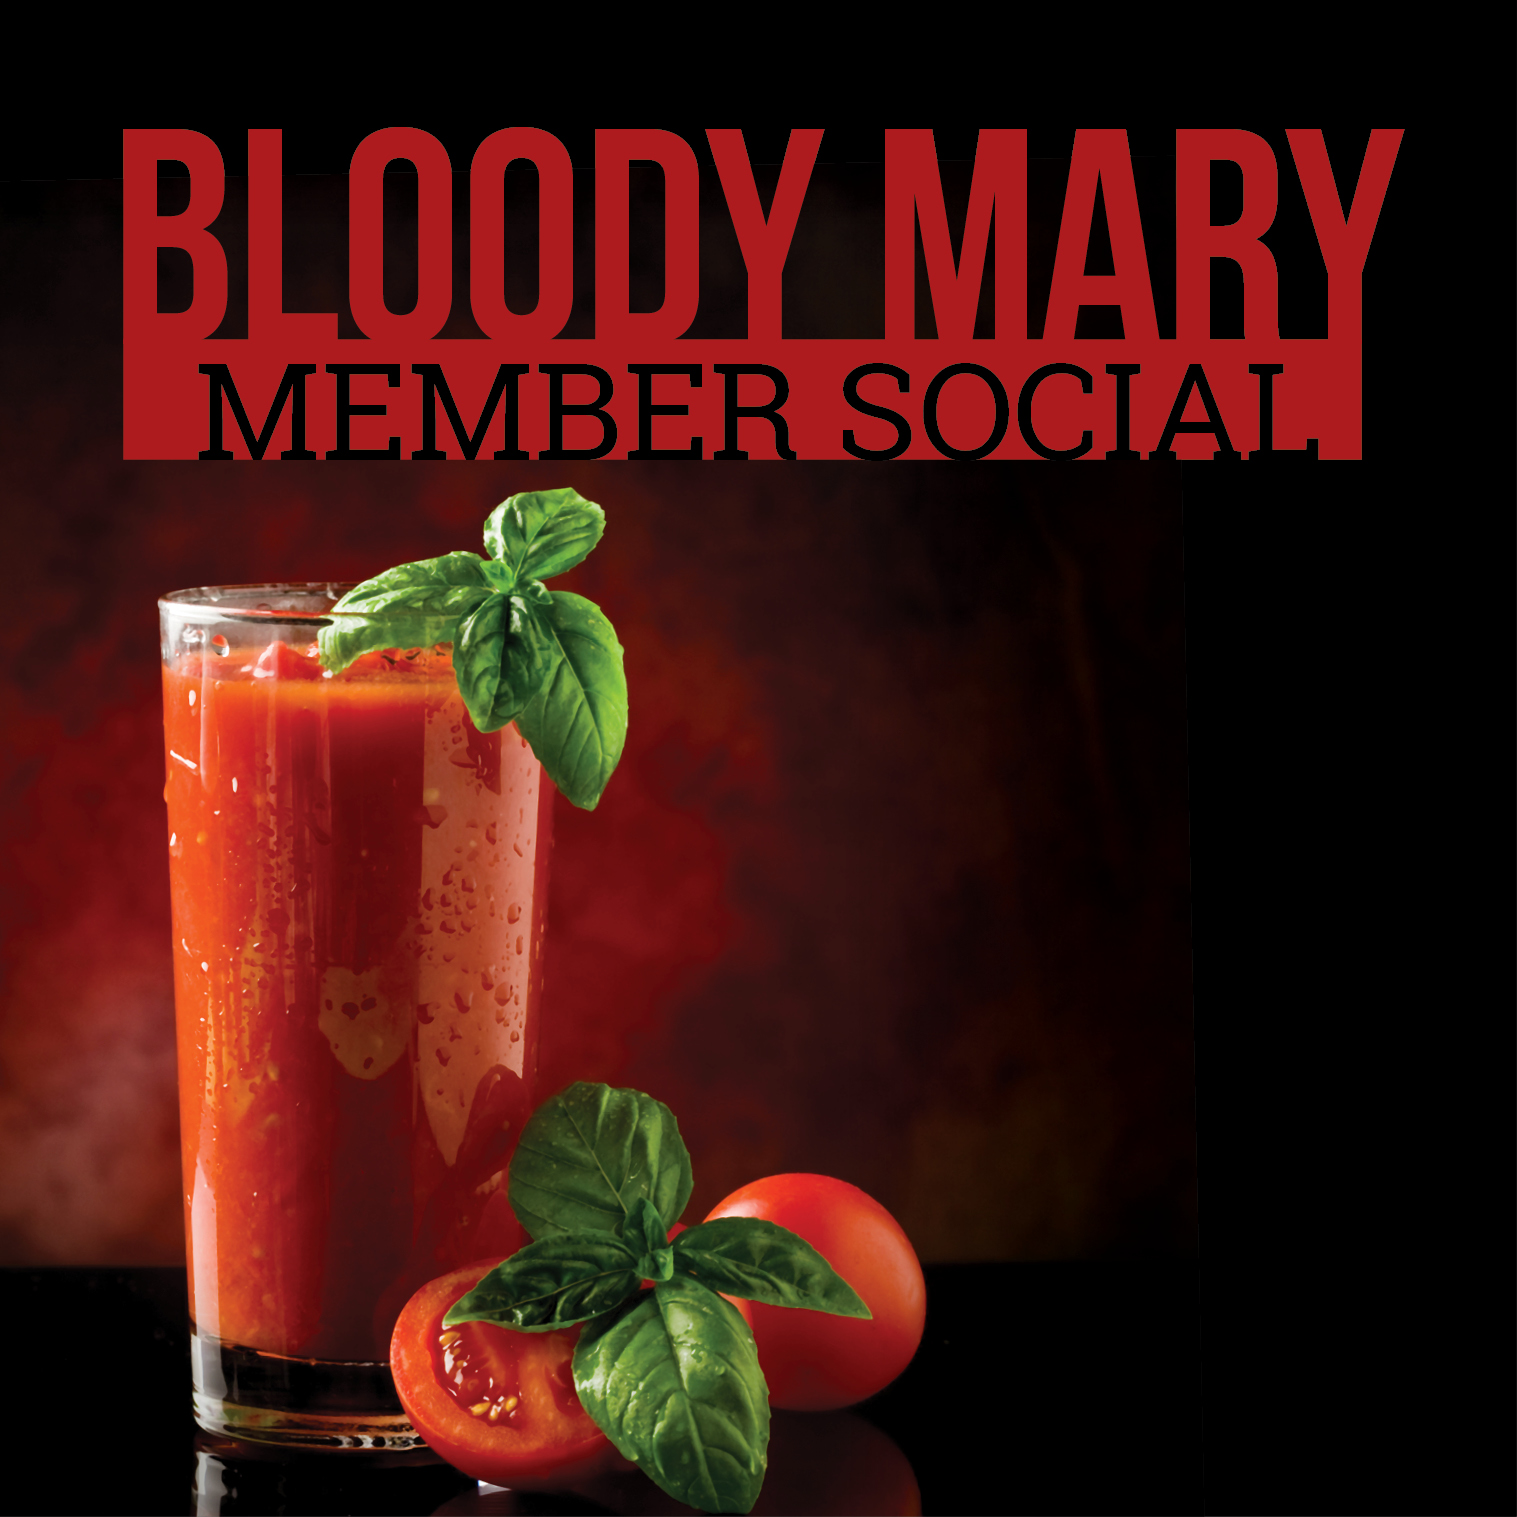 Bloody Mary Member Social